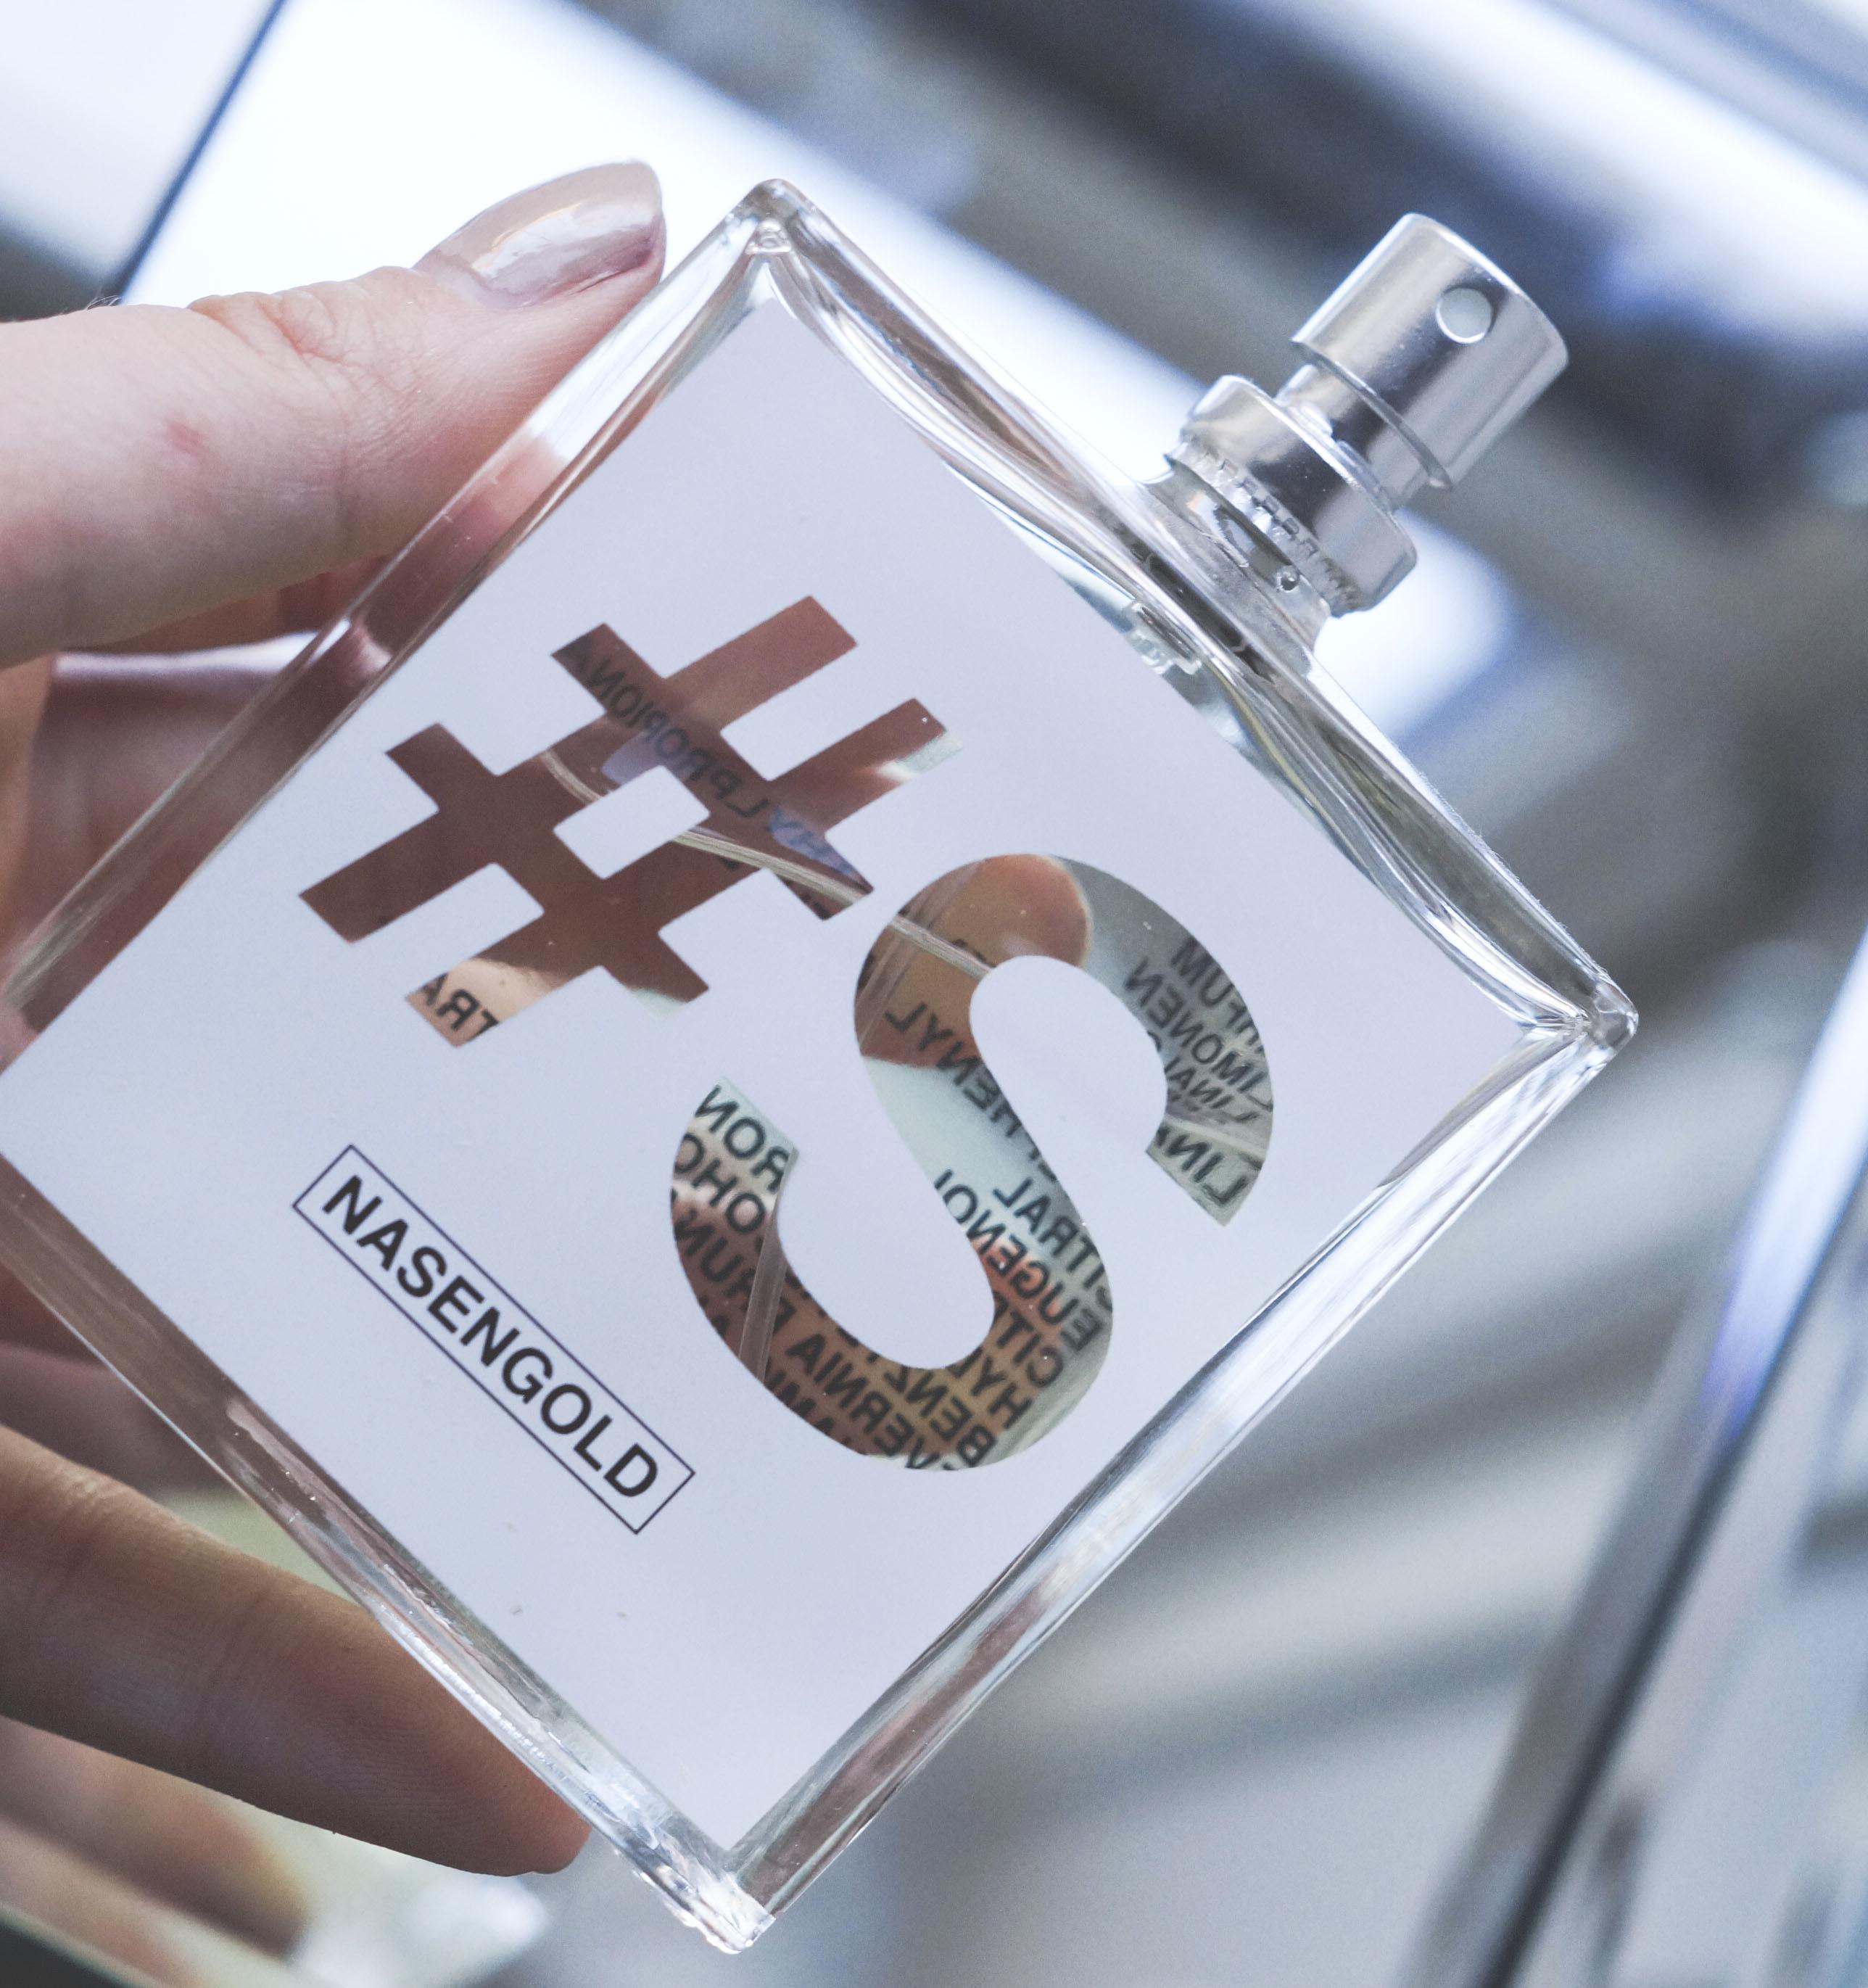 nasengold parfume, nasengold #s, #s perfume, bblogger, bbloggers, skønhedsblog, skønhedsblogger, caroline overgaard, beauty, beauty blog, beauty blogger, caroline overgaard